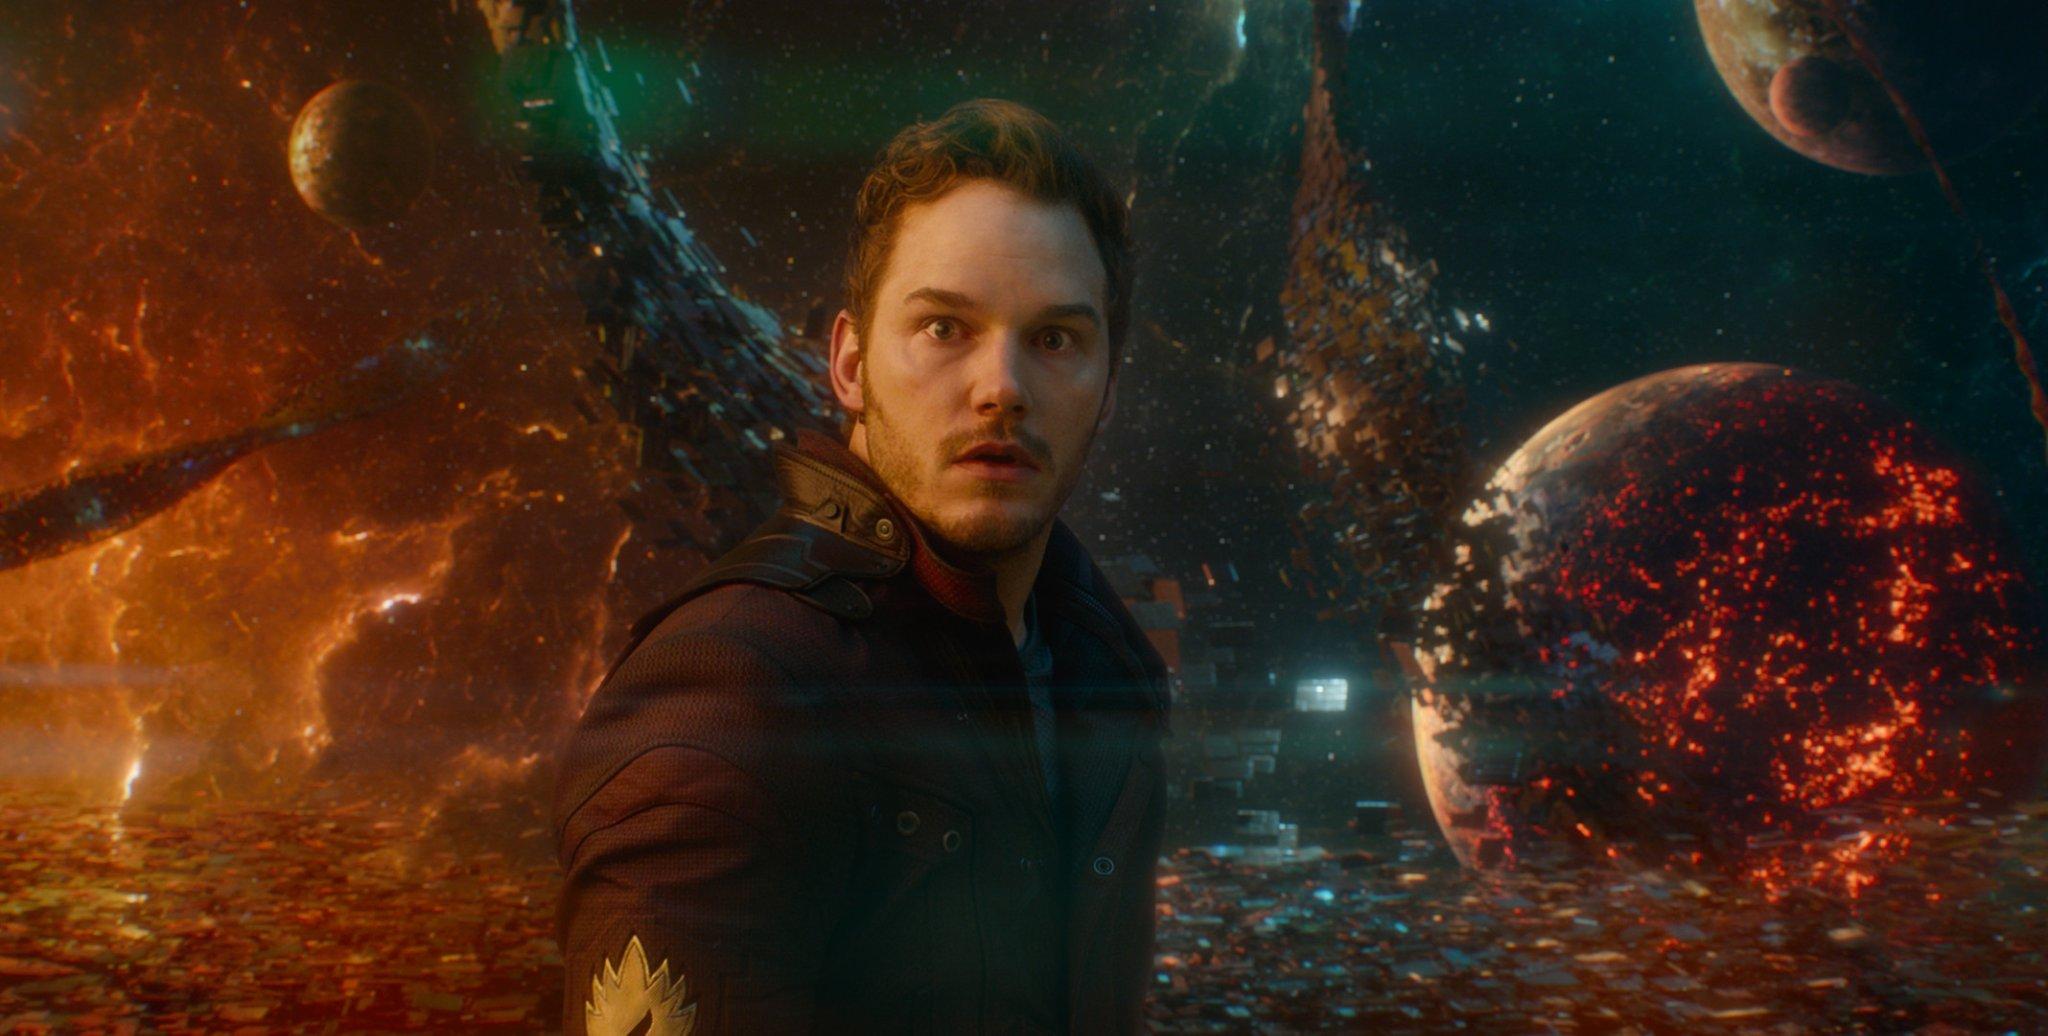 Guardians of the Galaxy Vol. 3: Disney Replacing Live Actors With CGI